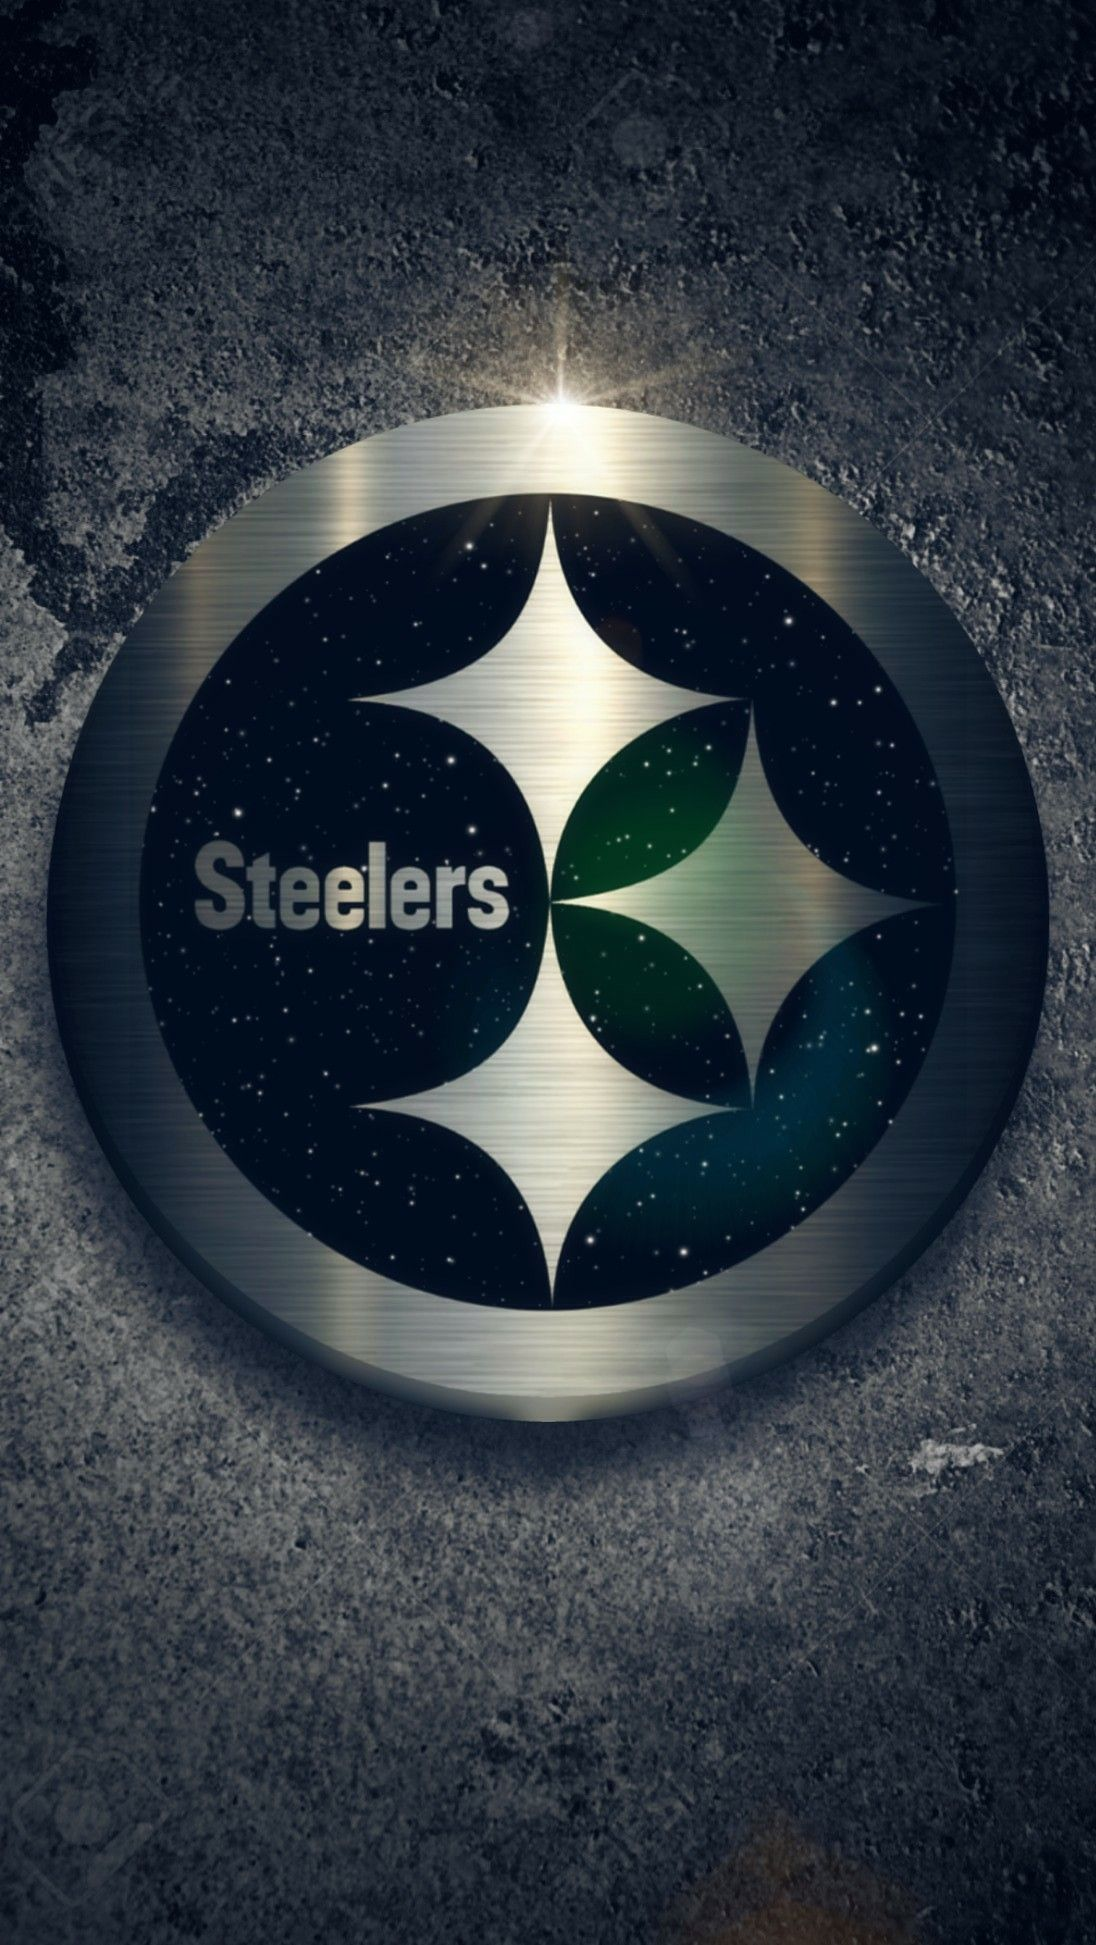 Nfl Steelers Logo Wallpaper Pittsburgh Steelers Wallpaper Pittsburgh Steelers Logo Steelers